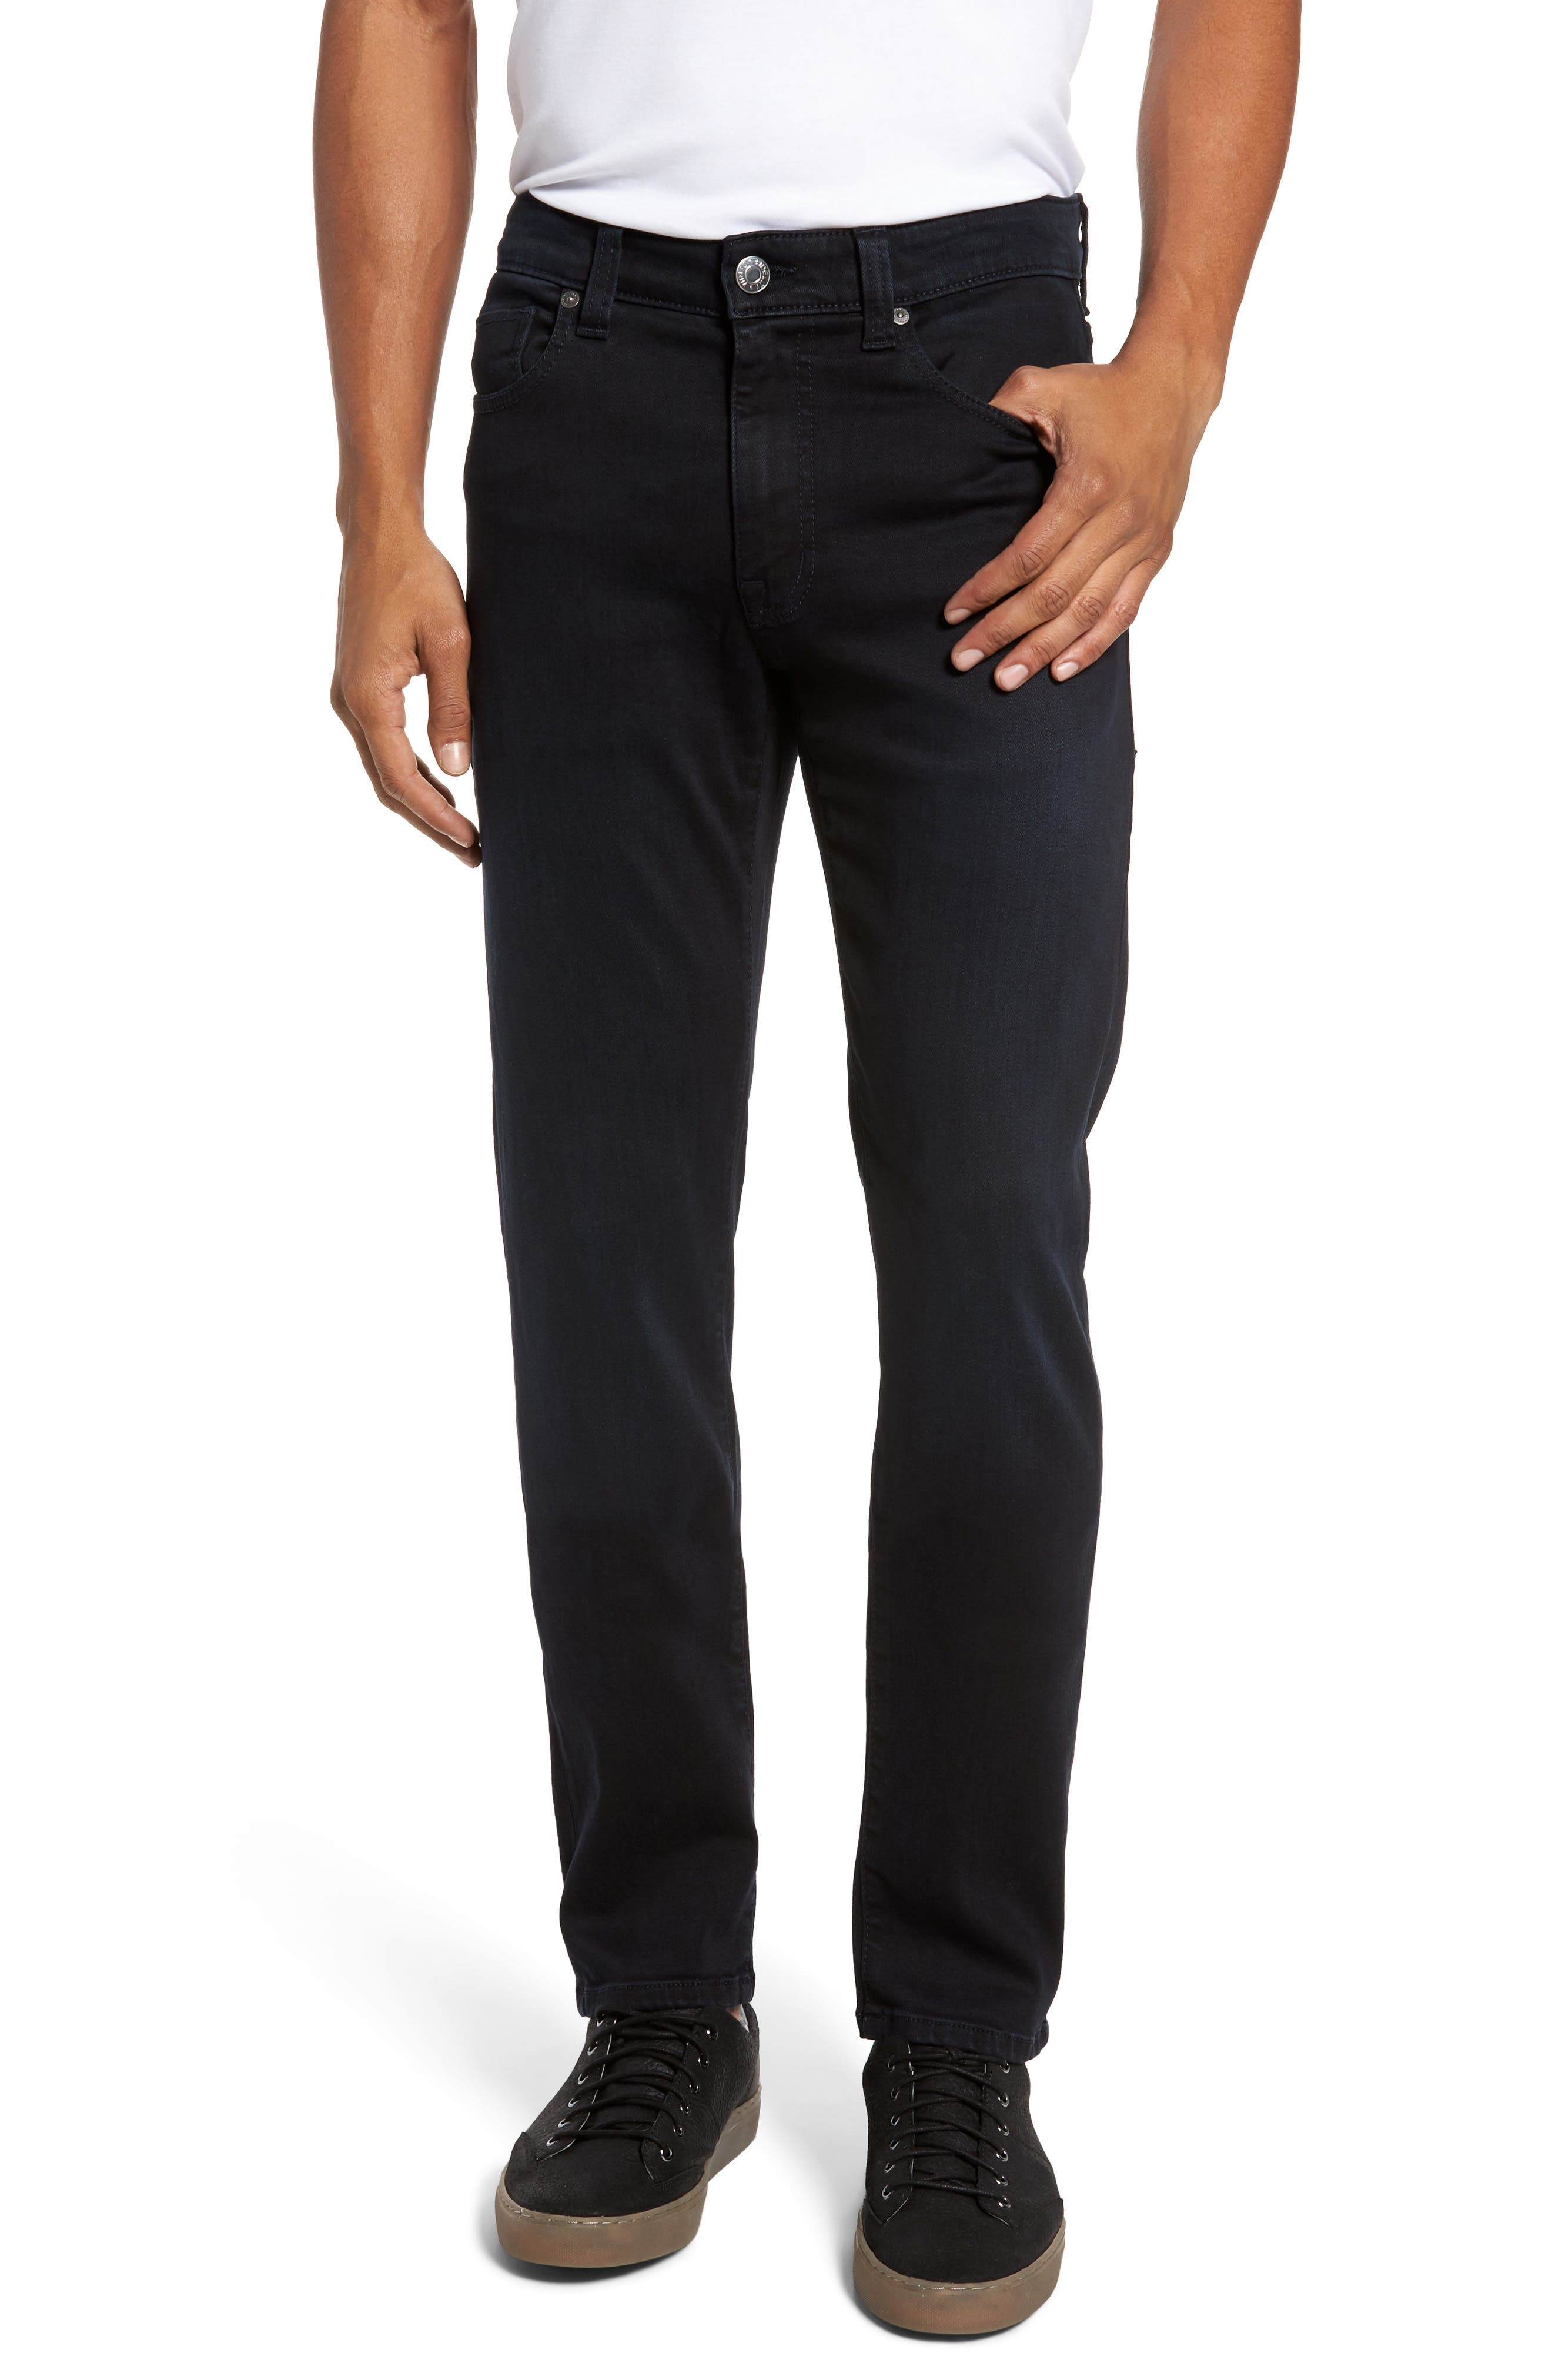 Main Image - Fidelity Denim Torino Slim Fit Jeans (Saffire Blue)